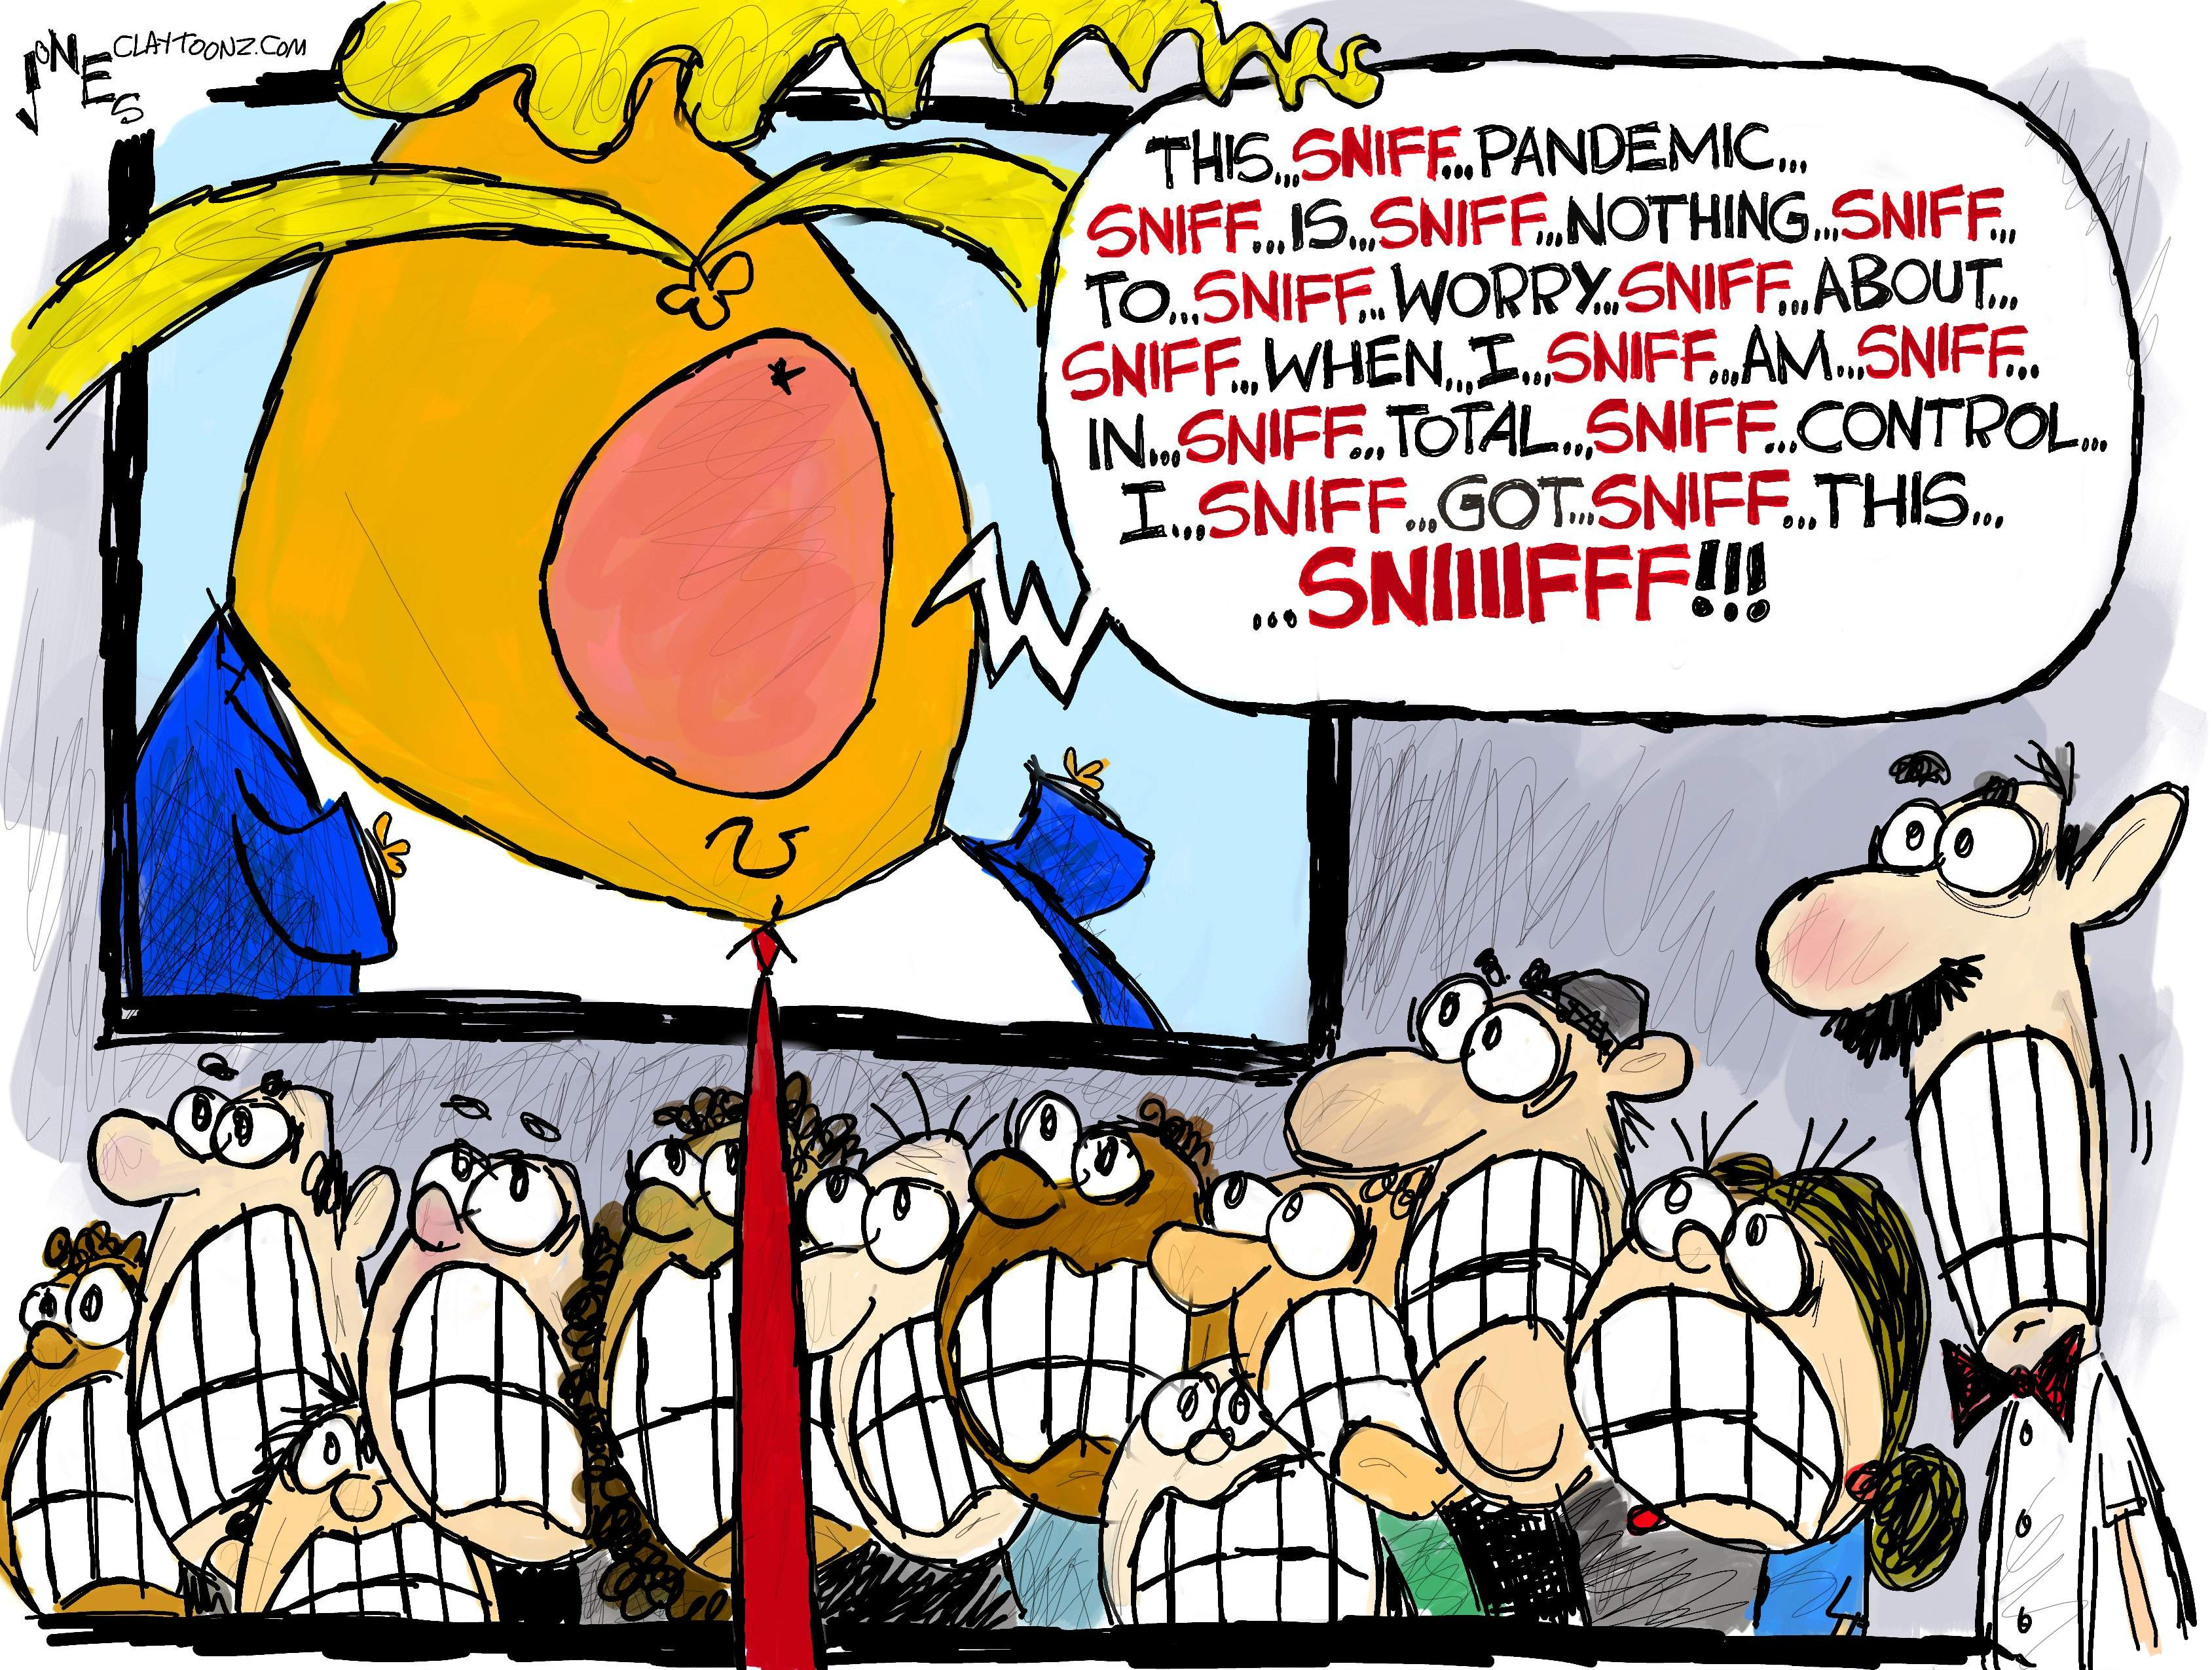 Sniffy S Got This In 2020 Editorial Cartoon Today Cartoon Trump Cartoons